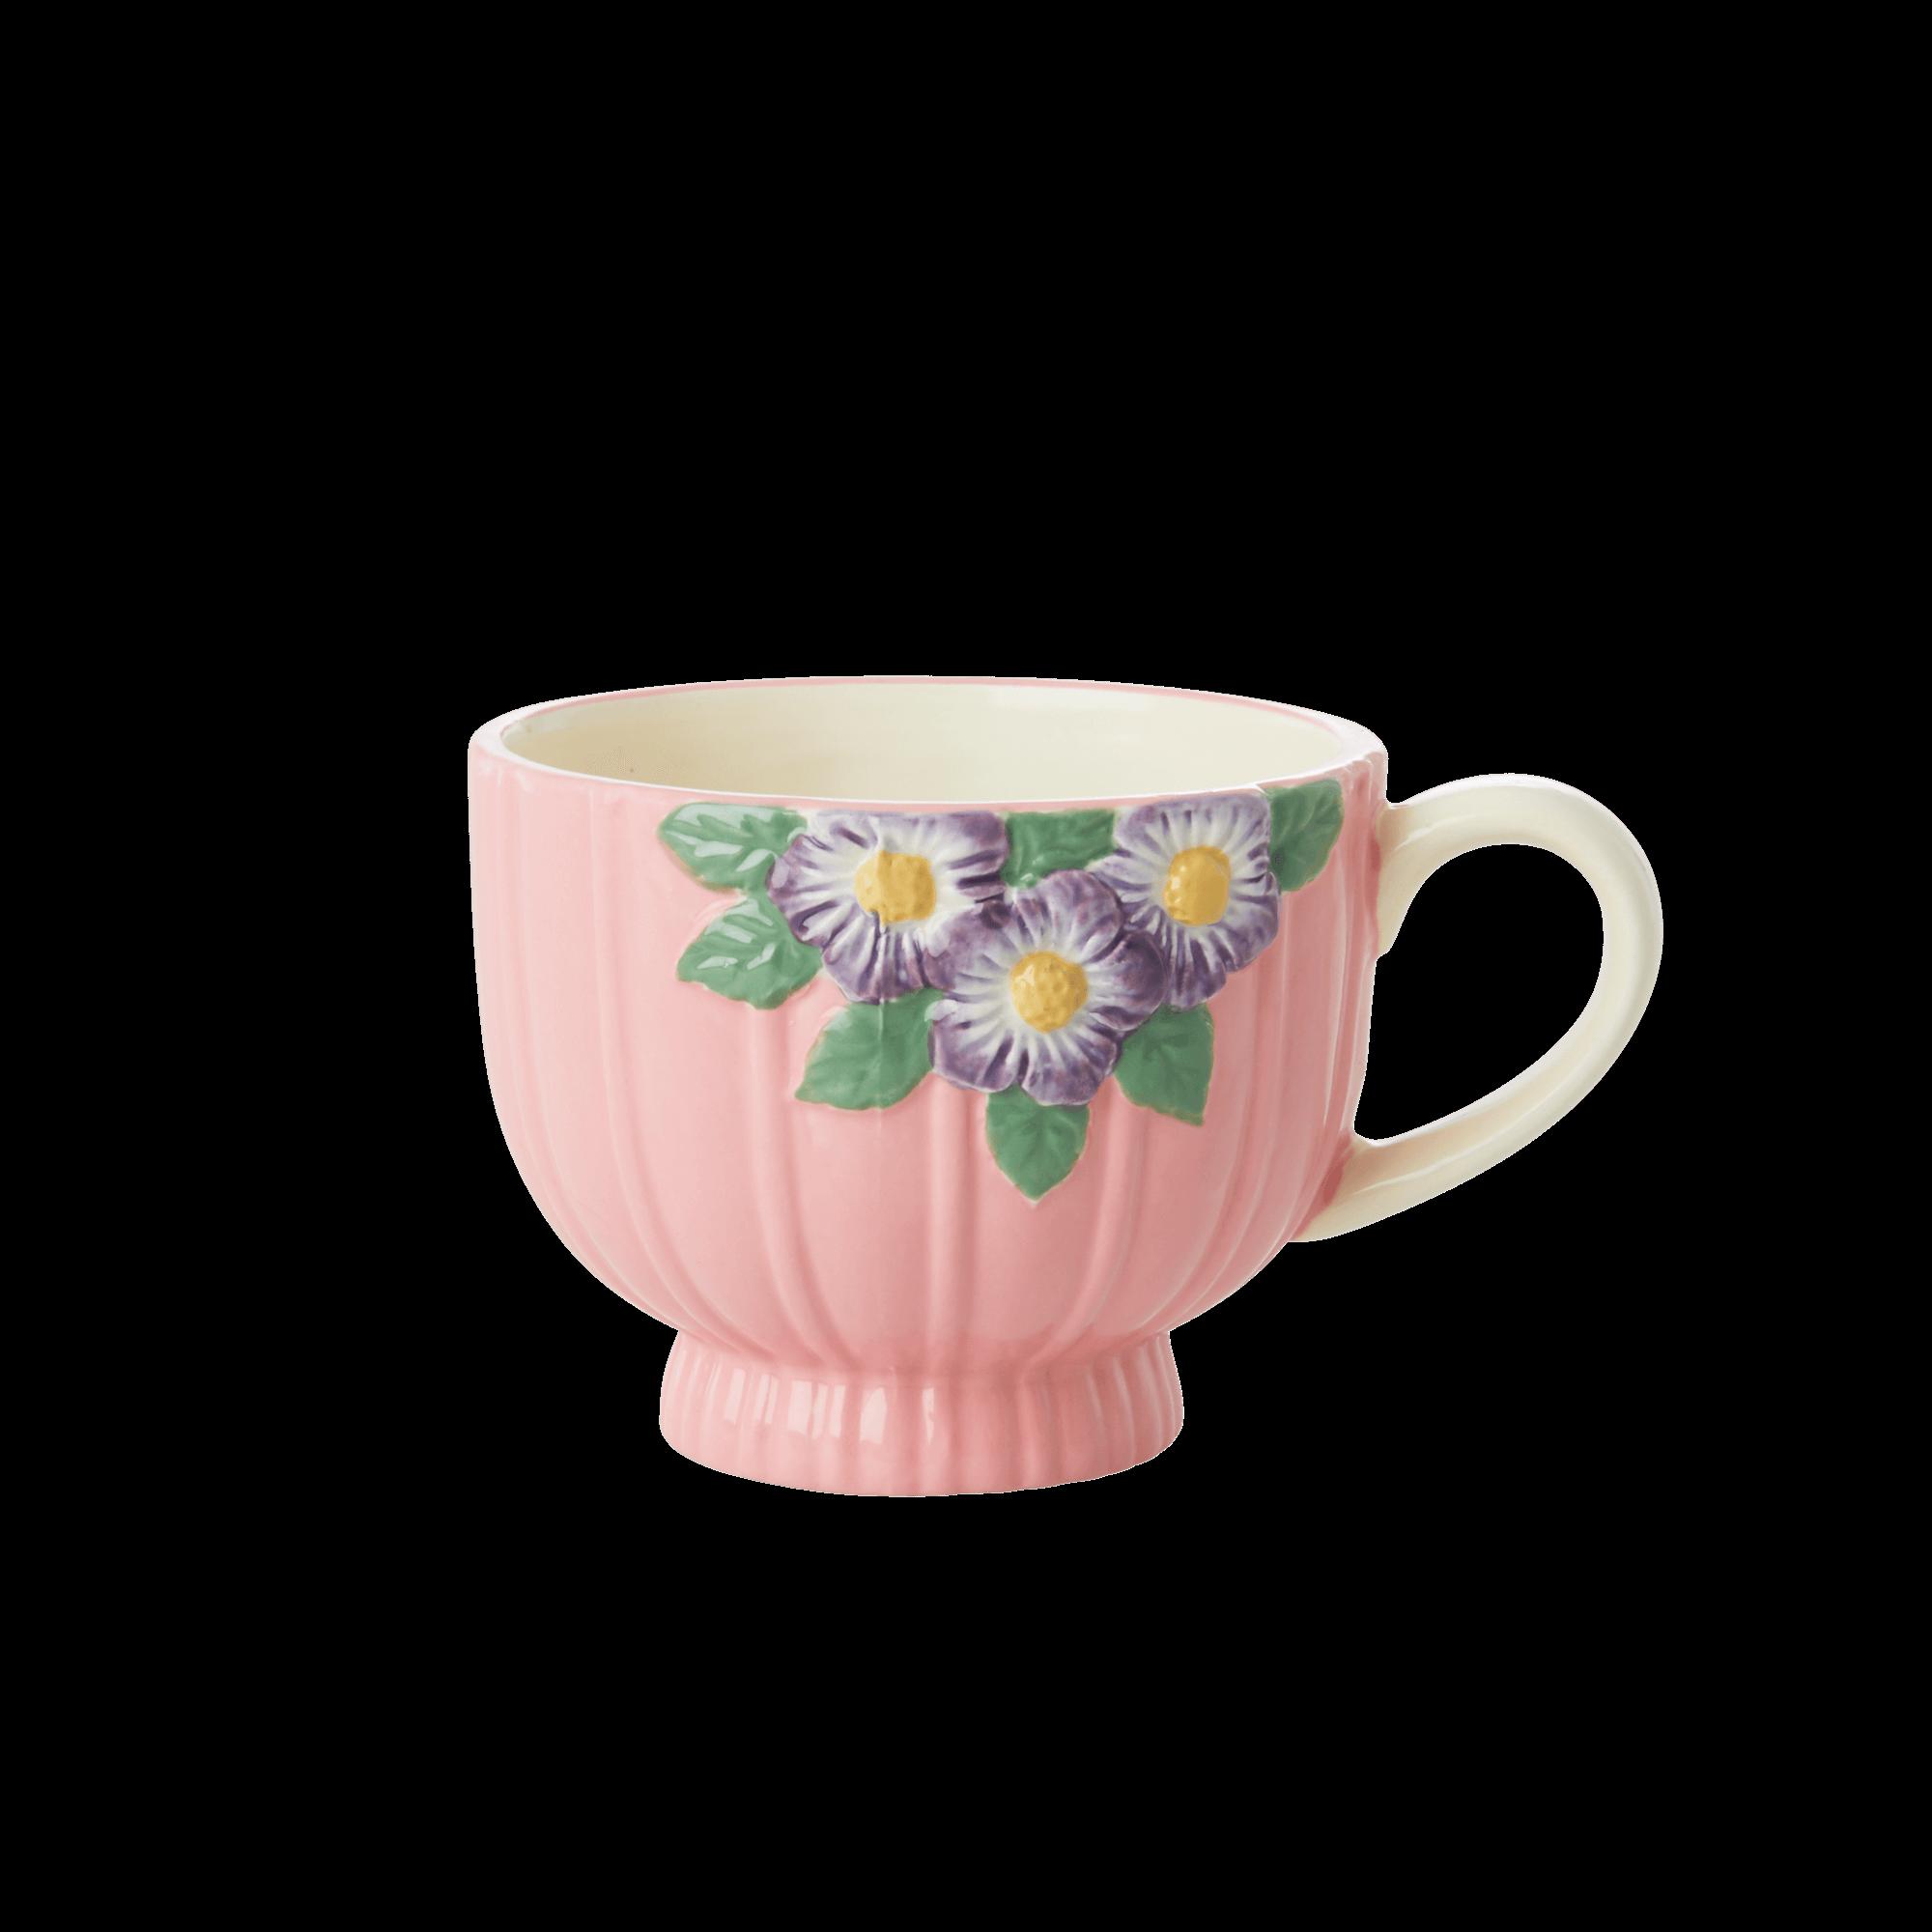 Rice - Ceramic Mug -Embossed Pink Flower Design